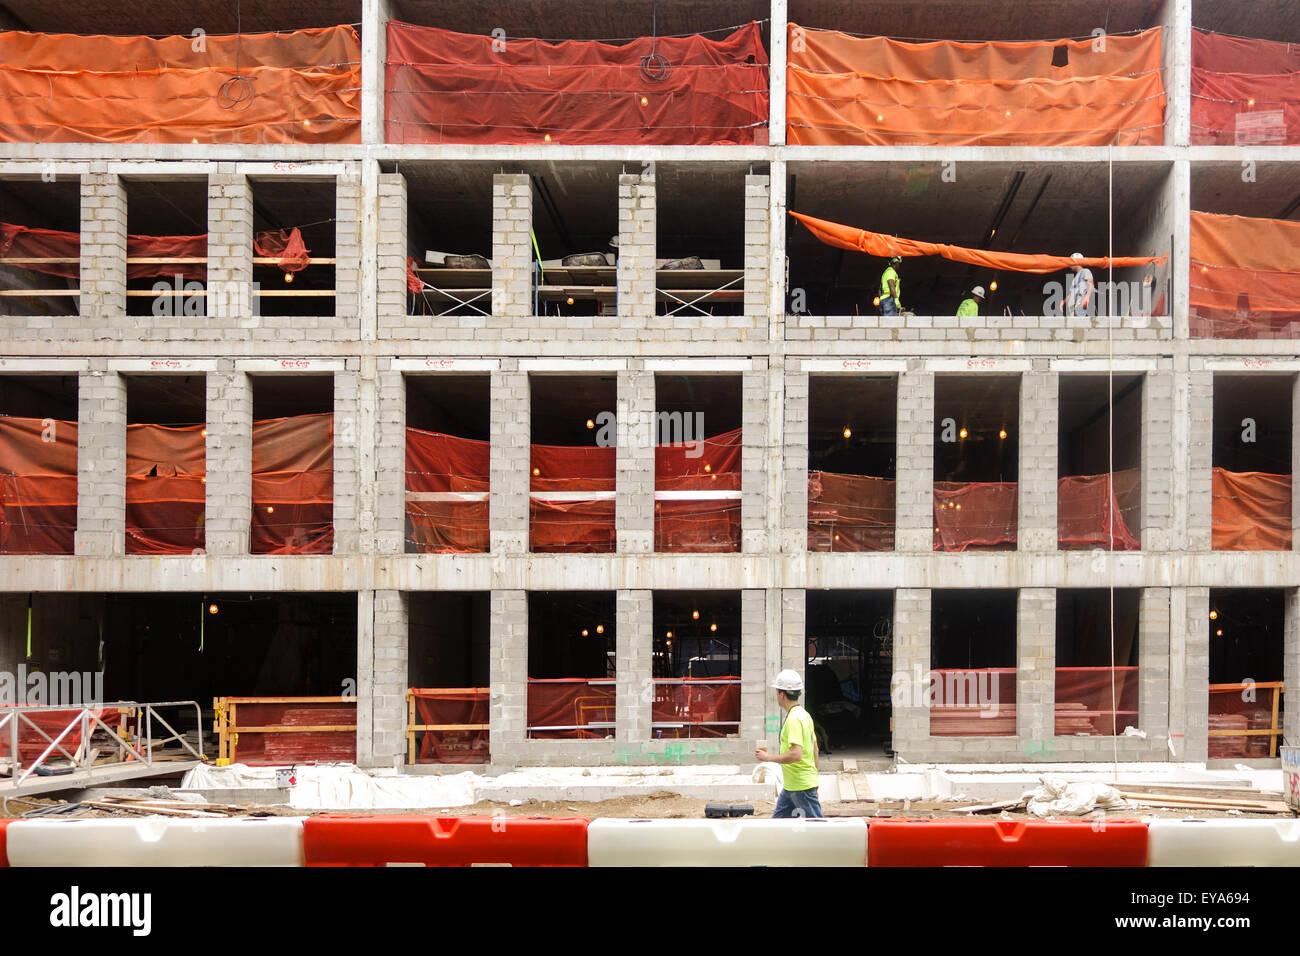 the-greenwich-lane-under-construction-fu